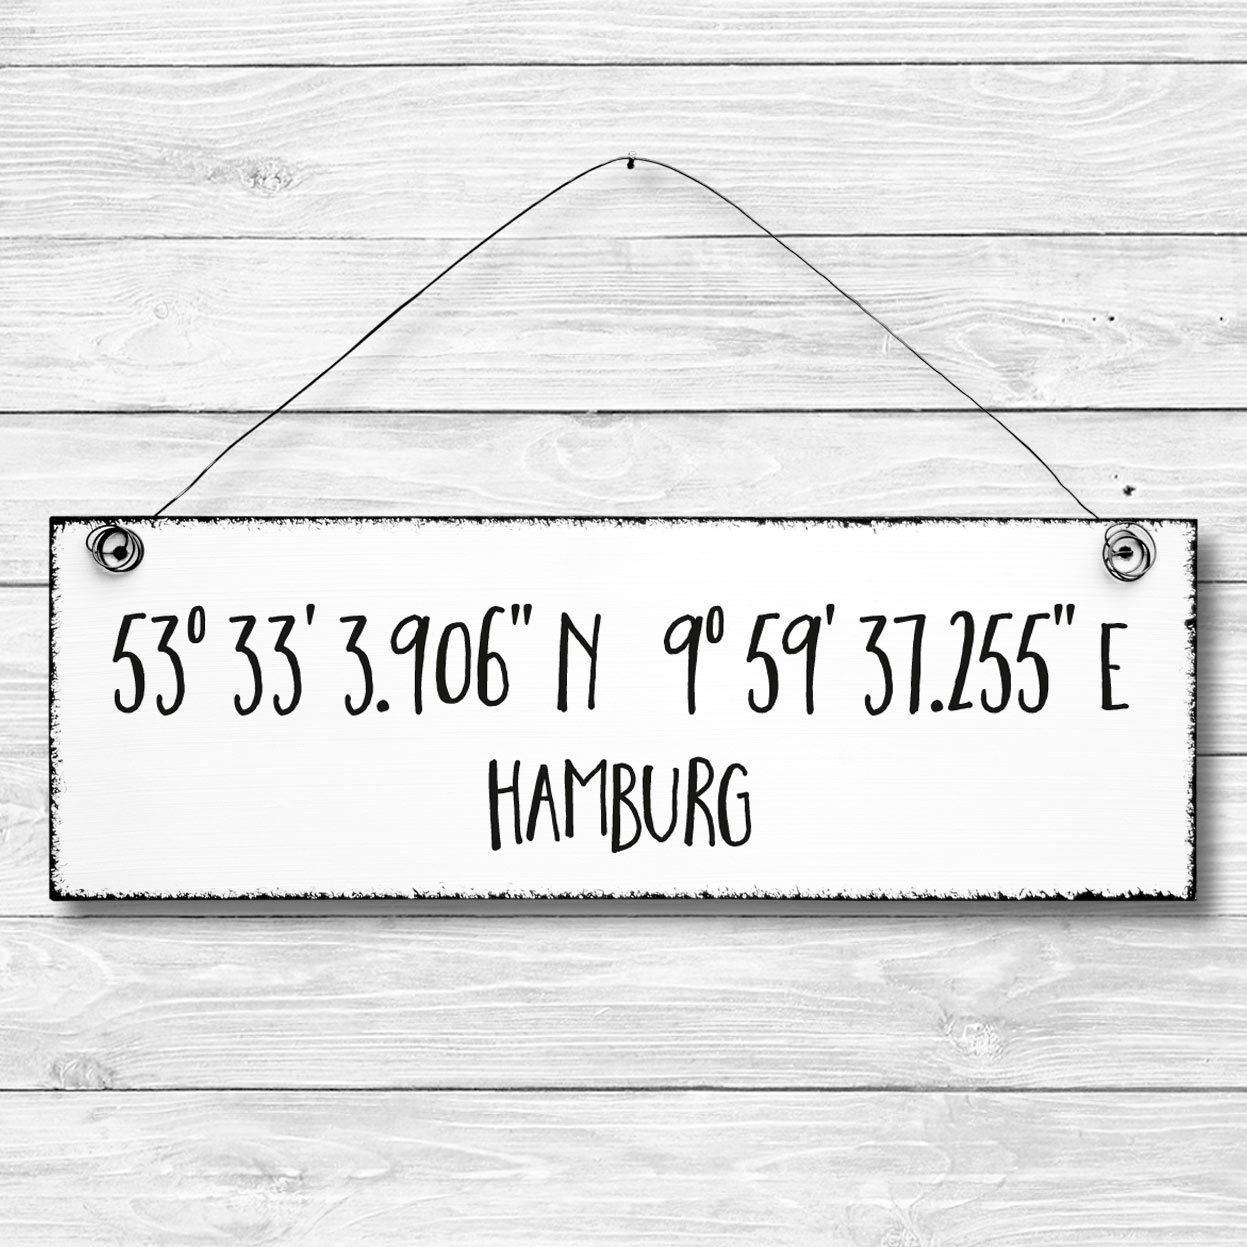 Shabby Holz Deko Wand Tür Schild BERLIN Koordinaten Dekoschild Wandschild